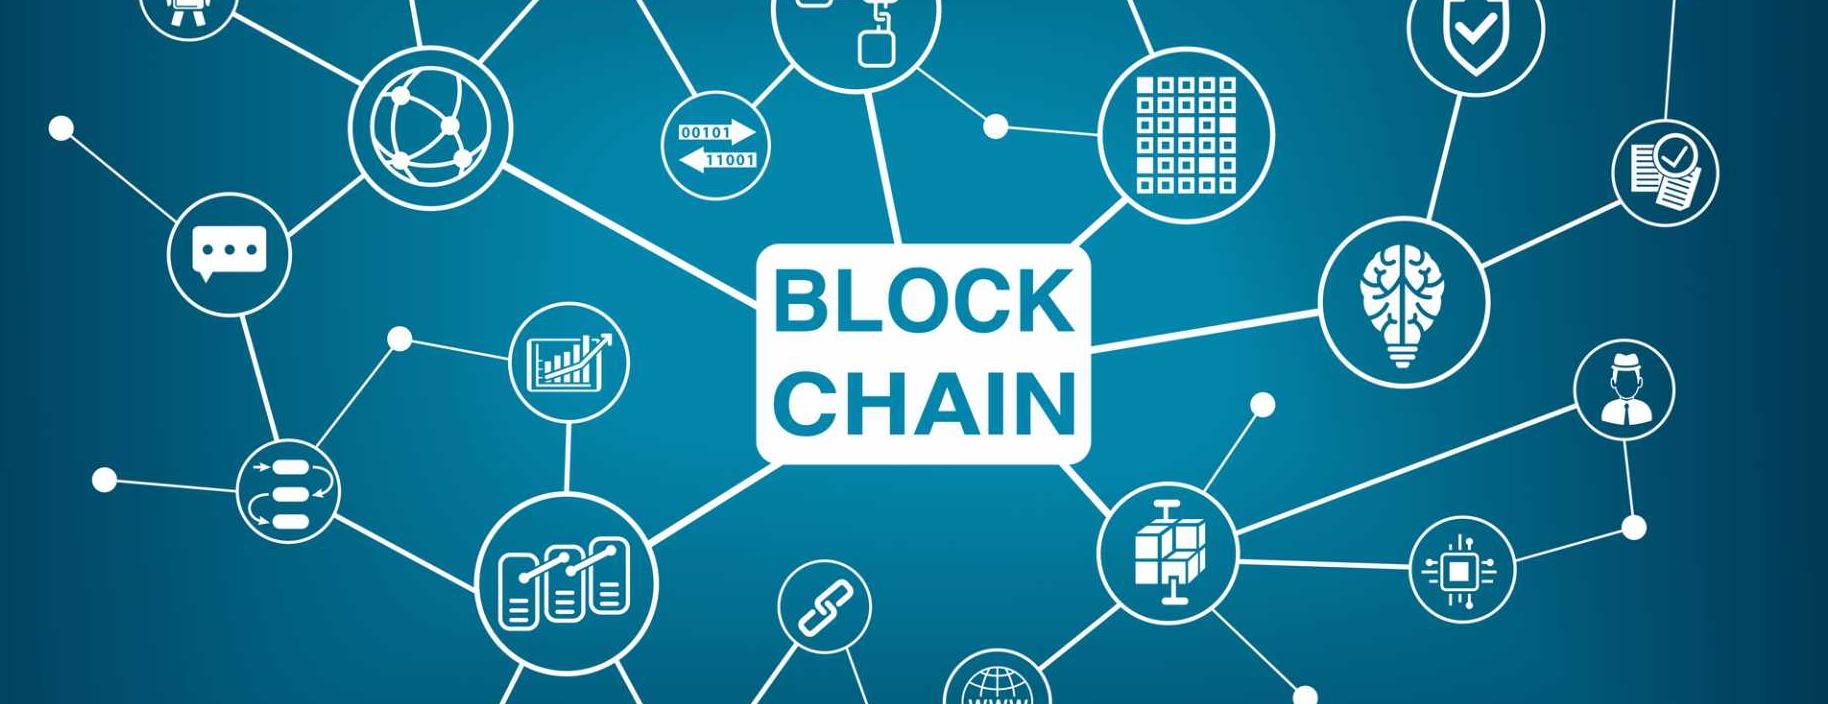 CROP - Blockchain - Depositphotos_136452644_l-2015